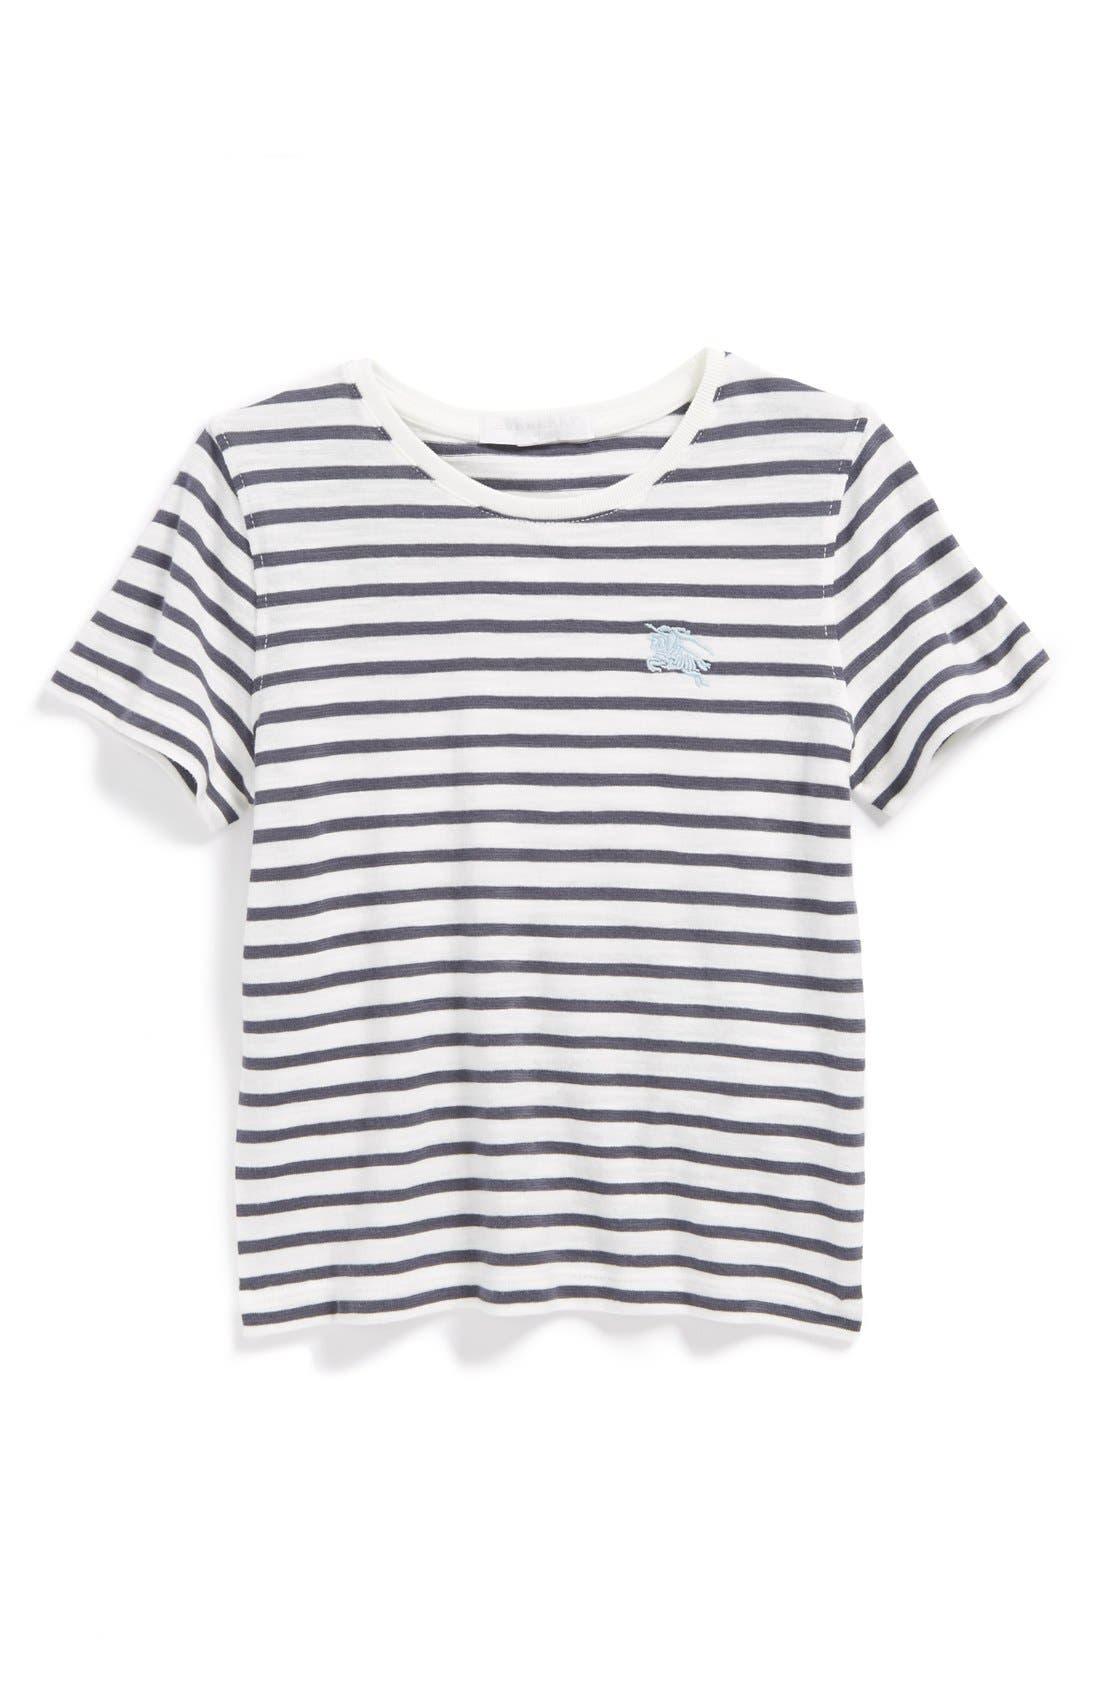 Main Image - Burberry Stripe T-Shirt (Little Boys & Big Boys)